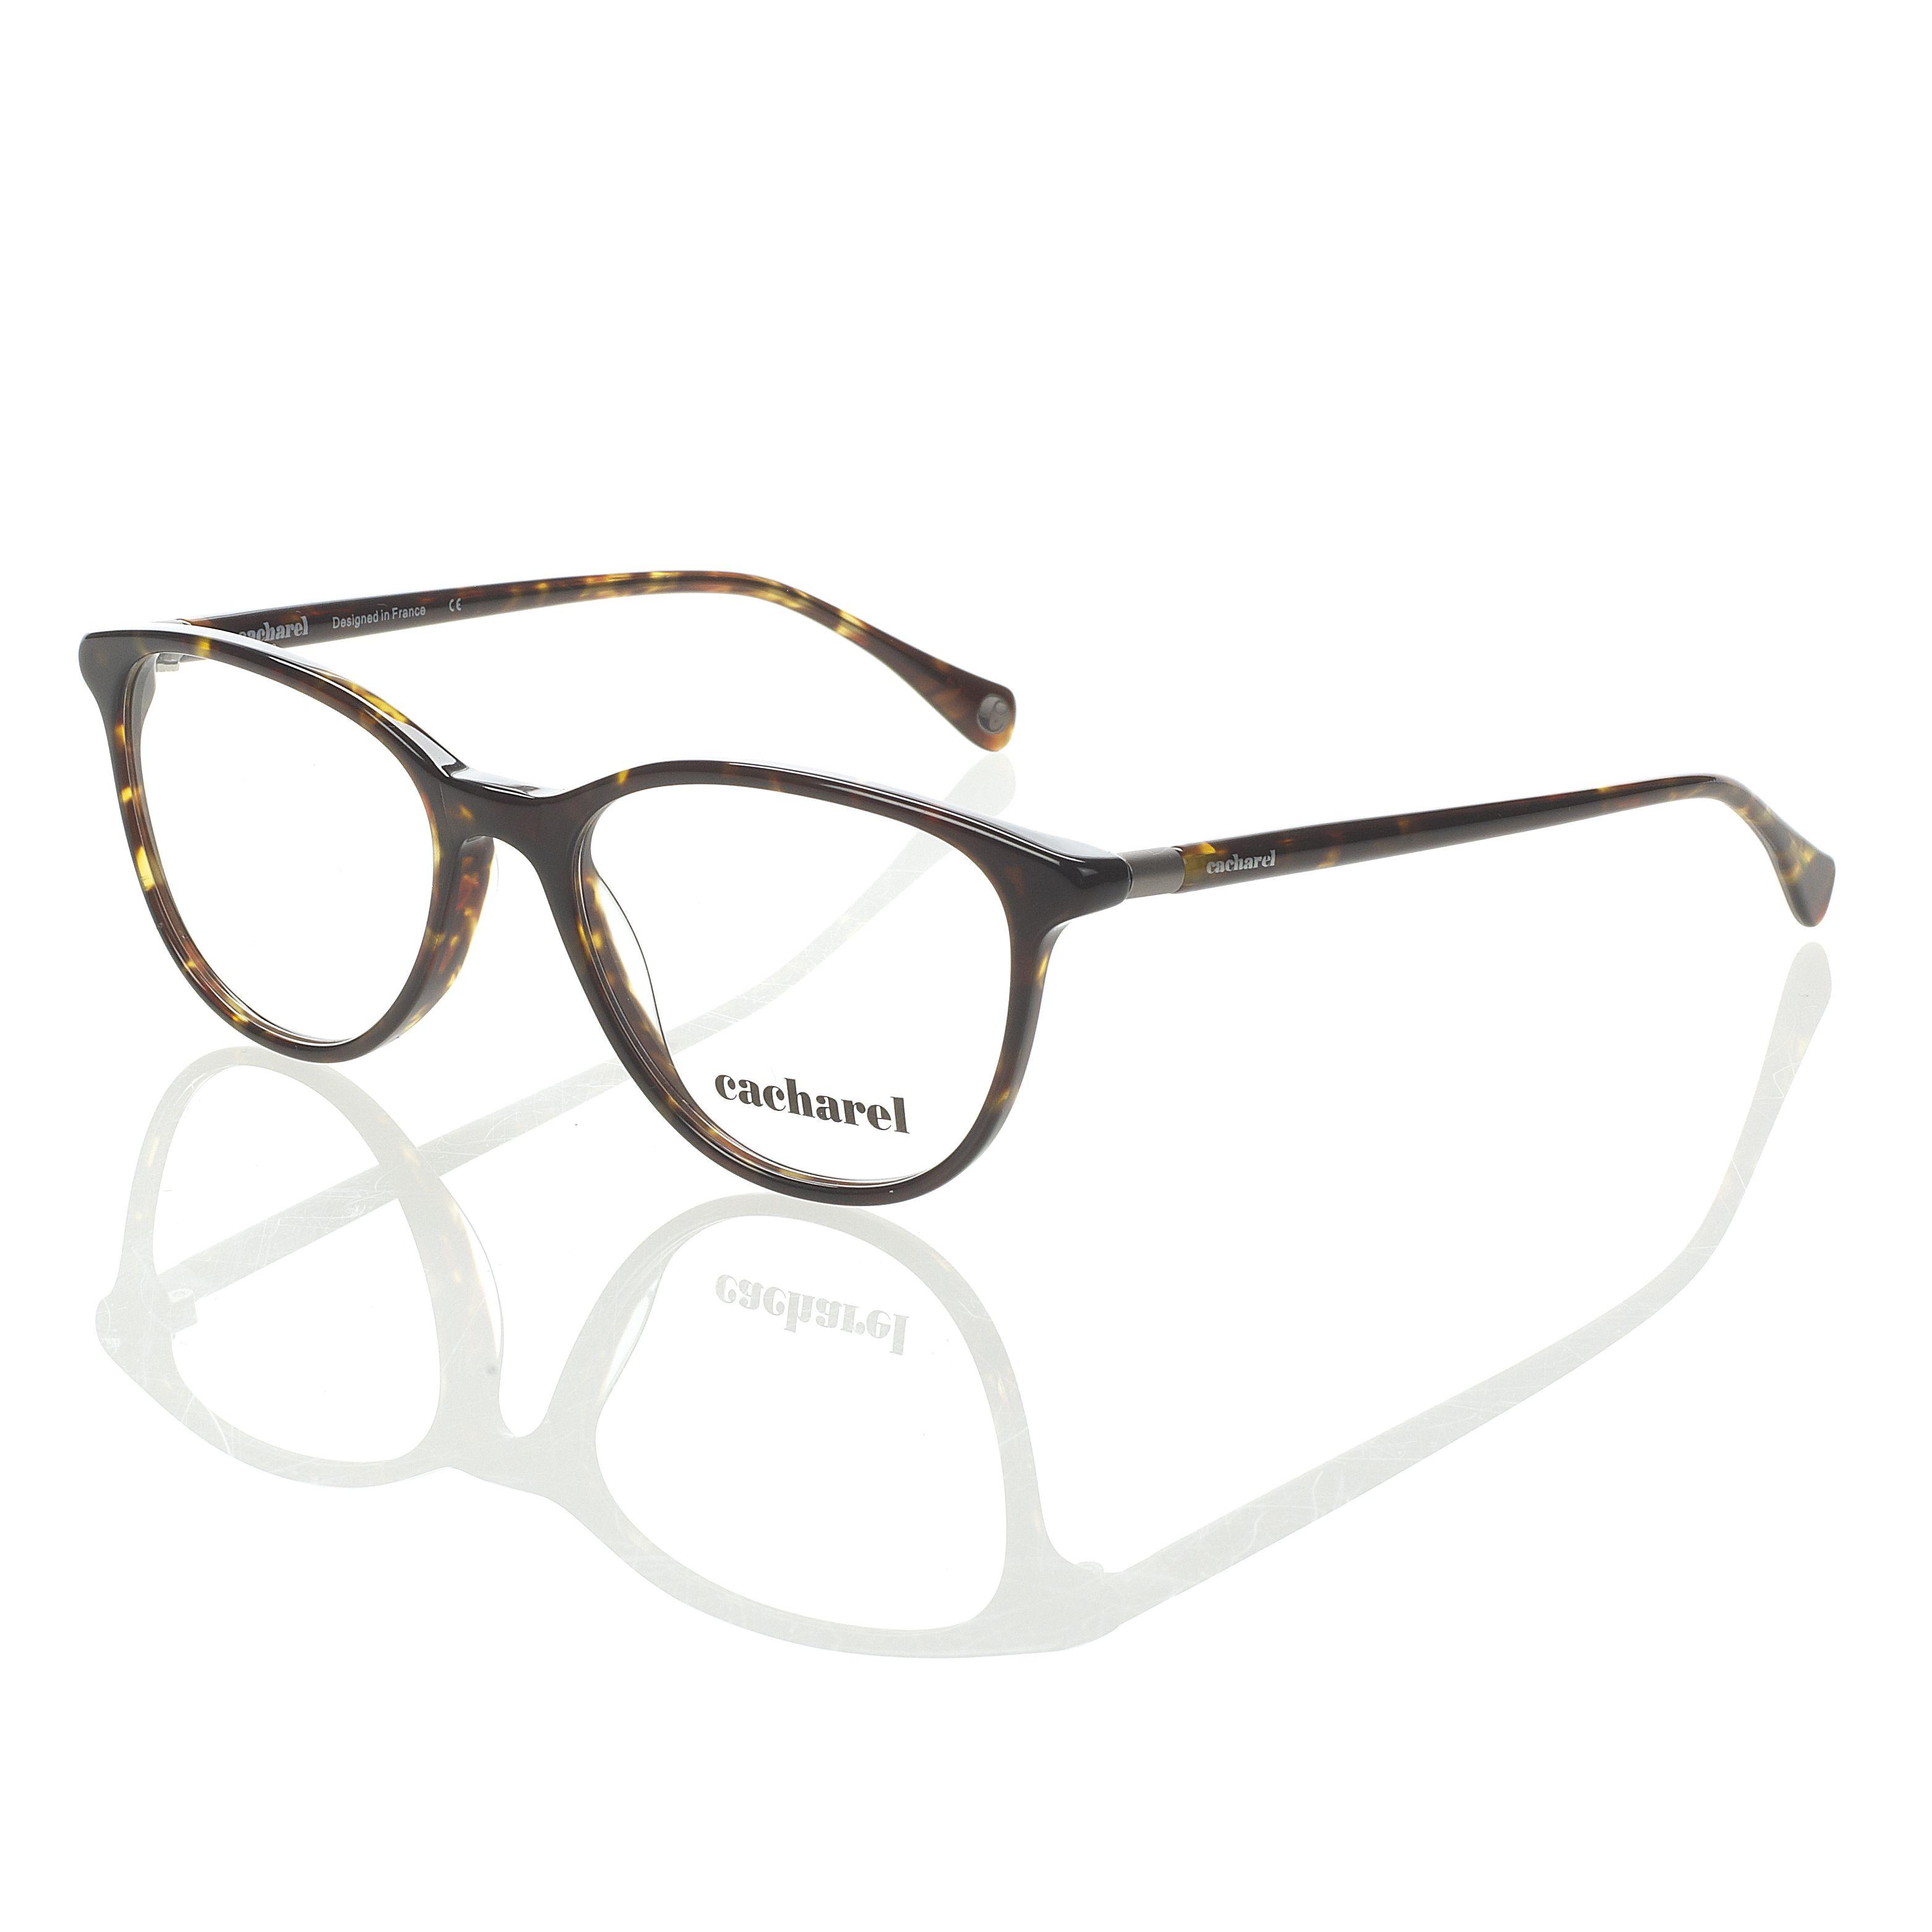 565f10c1981 Lunettes Cacharel CA3014 - 135   Glasses 8)   Glasses, Glass, Eyes